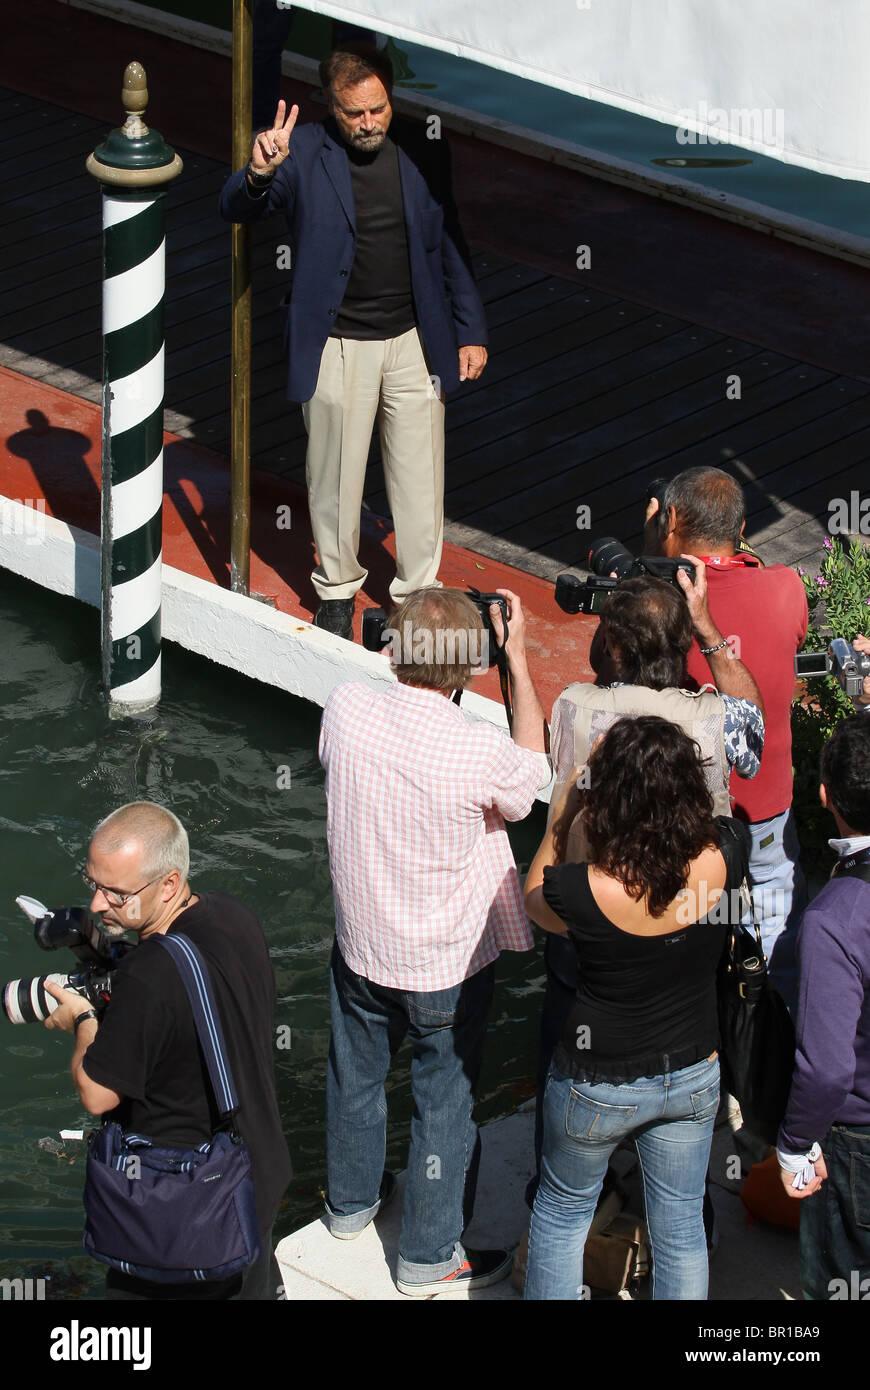 FRANCO NERO ACTOR DEPARTS LIDO. 67H VENICE FILM FESTIVAL VENICE  ITALY 09 September 2010 - Stock Image